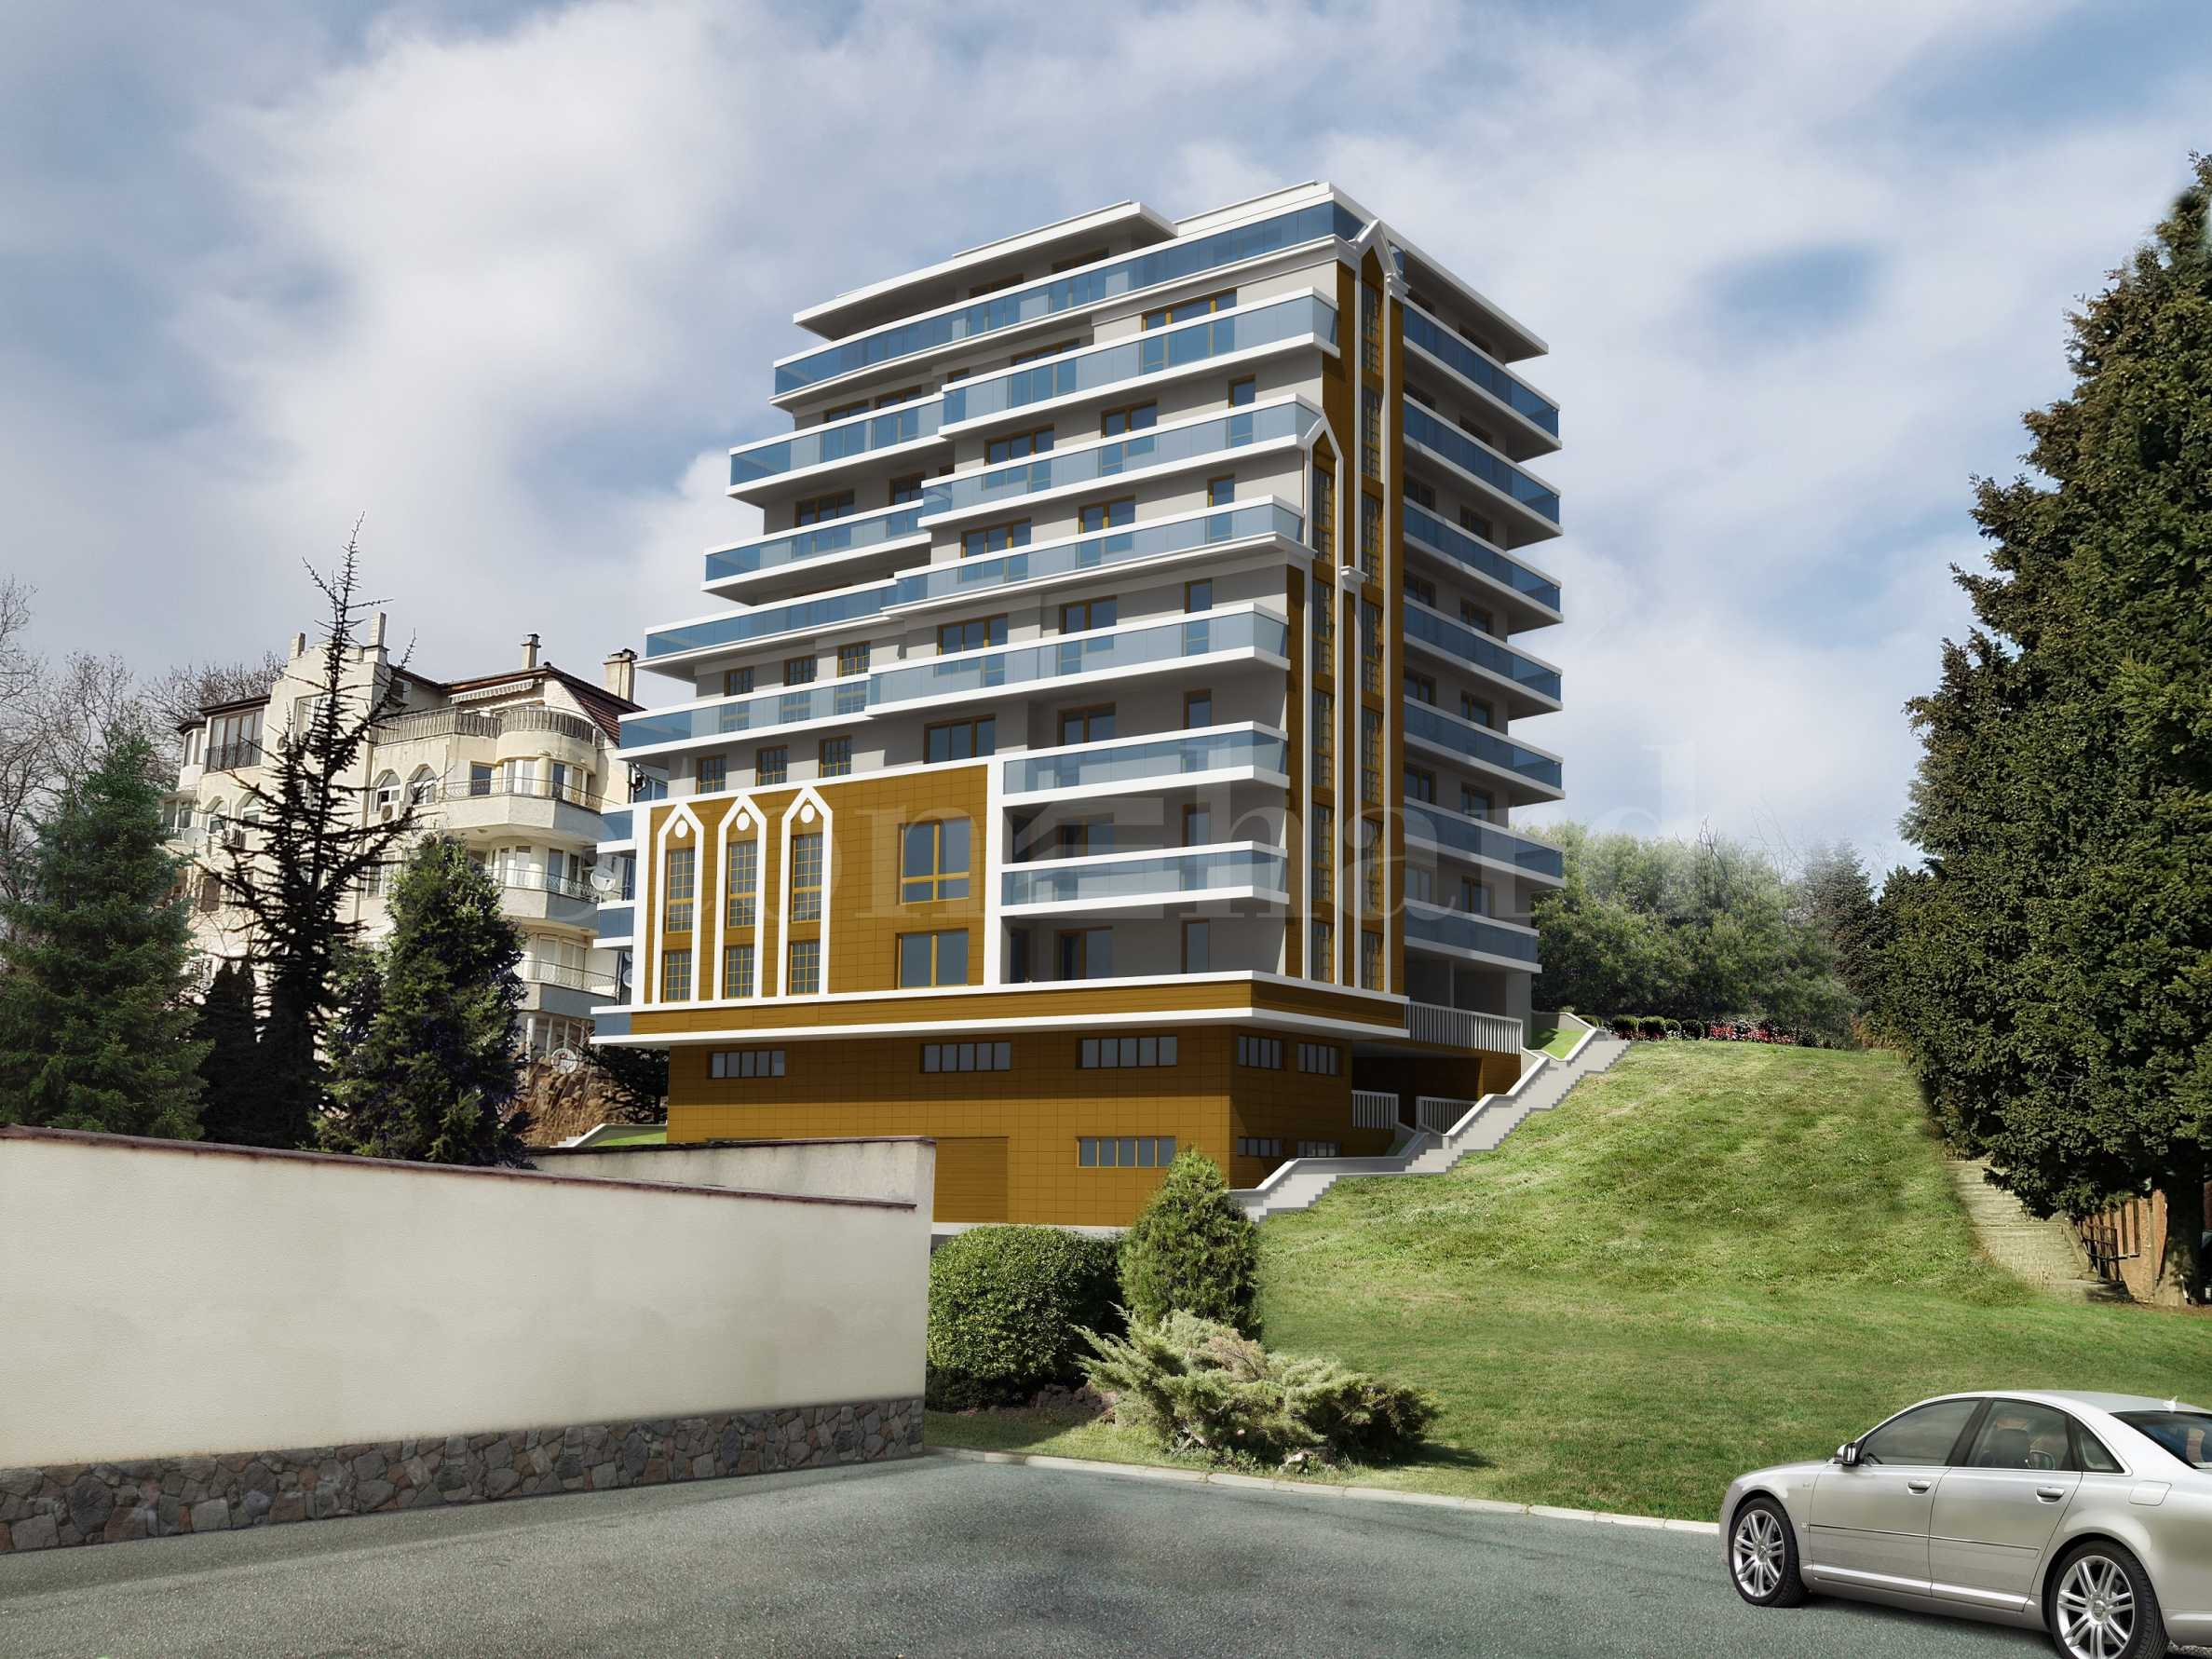 Stonehard Breeze Residence —нови апартаменти в кв. Бриз-юг, недалеч Морската градина1 - Stonehard